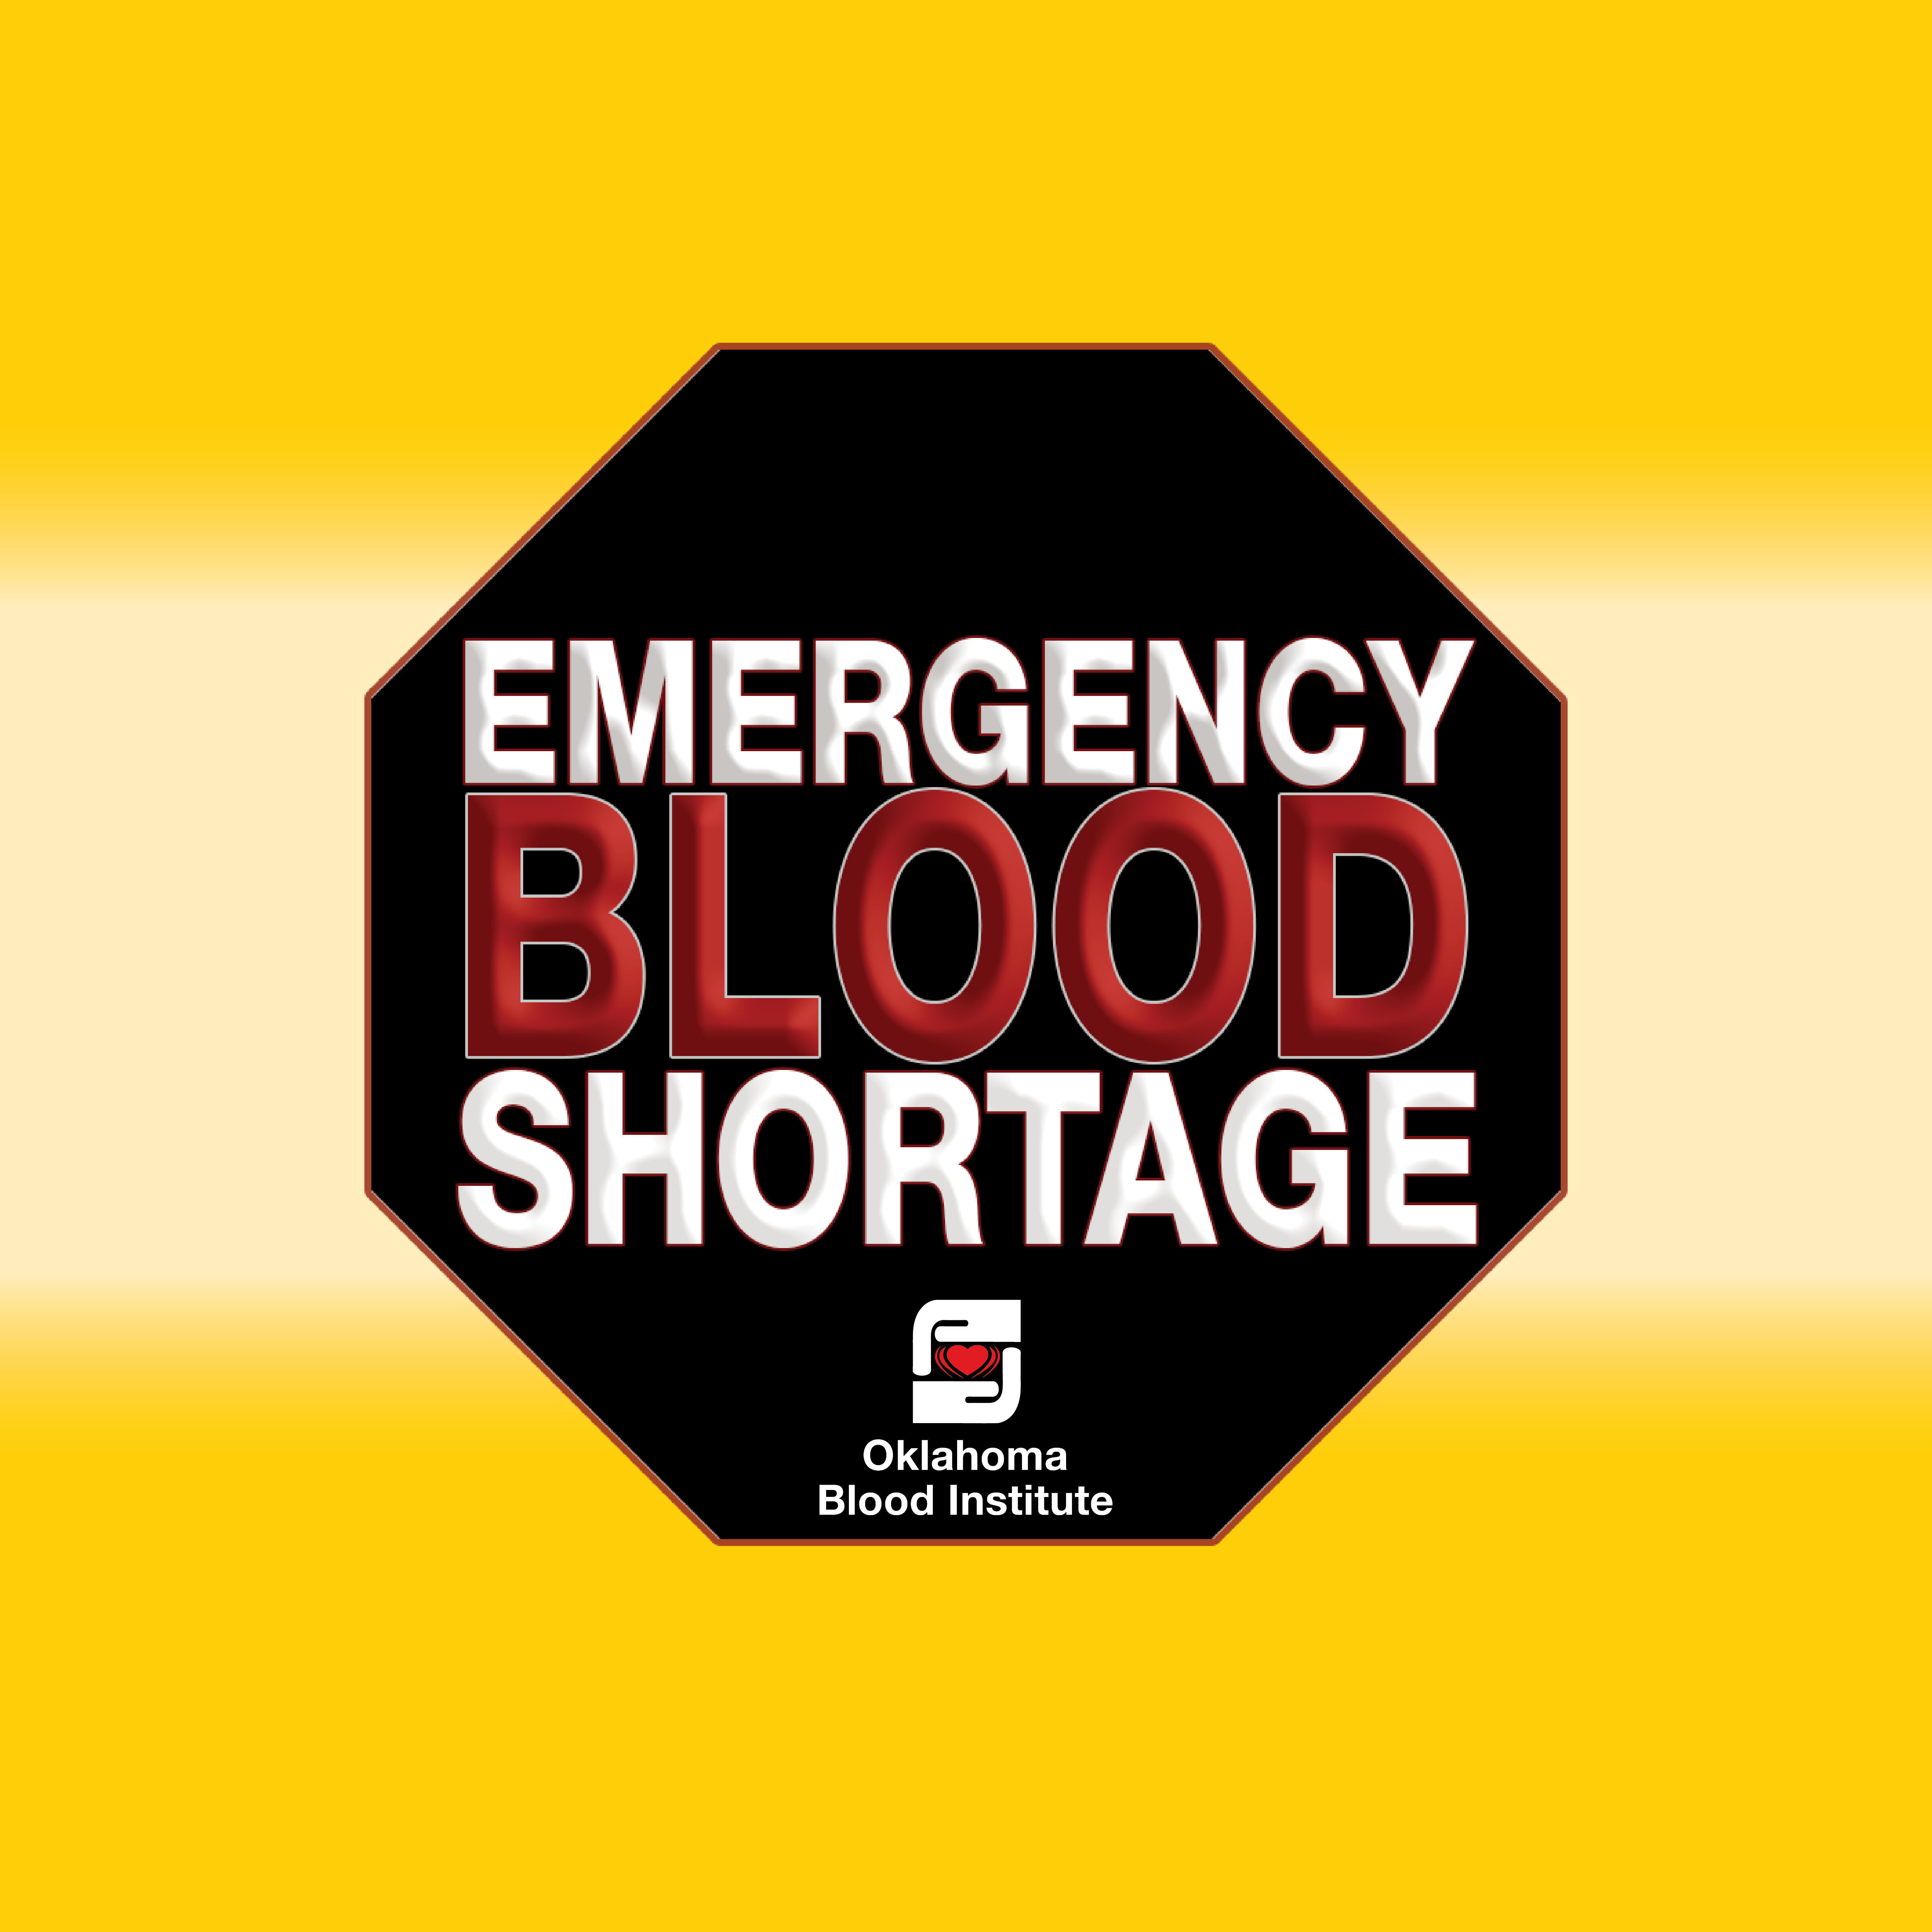 Emergency Blood Shortage  DonorsCriticallyNeededFollowingIce Storm